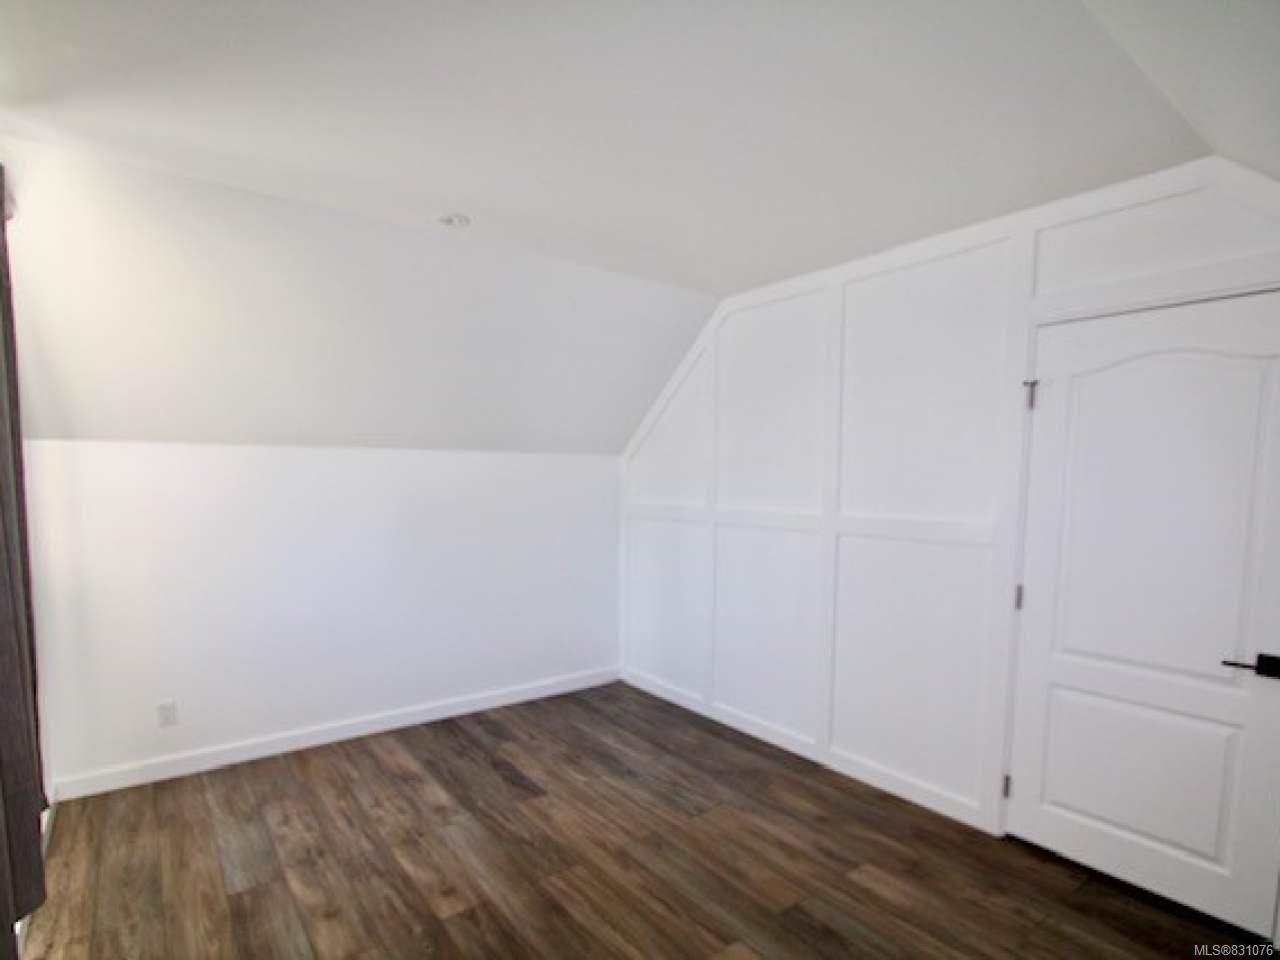 Photo 35: Photos: 6159 Strathcona St in PORT ALBERNI: PA Alberni Valley House for sale (Port Alberni)  : MLS®# 831076